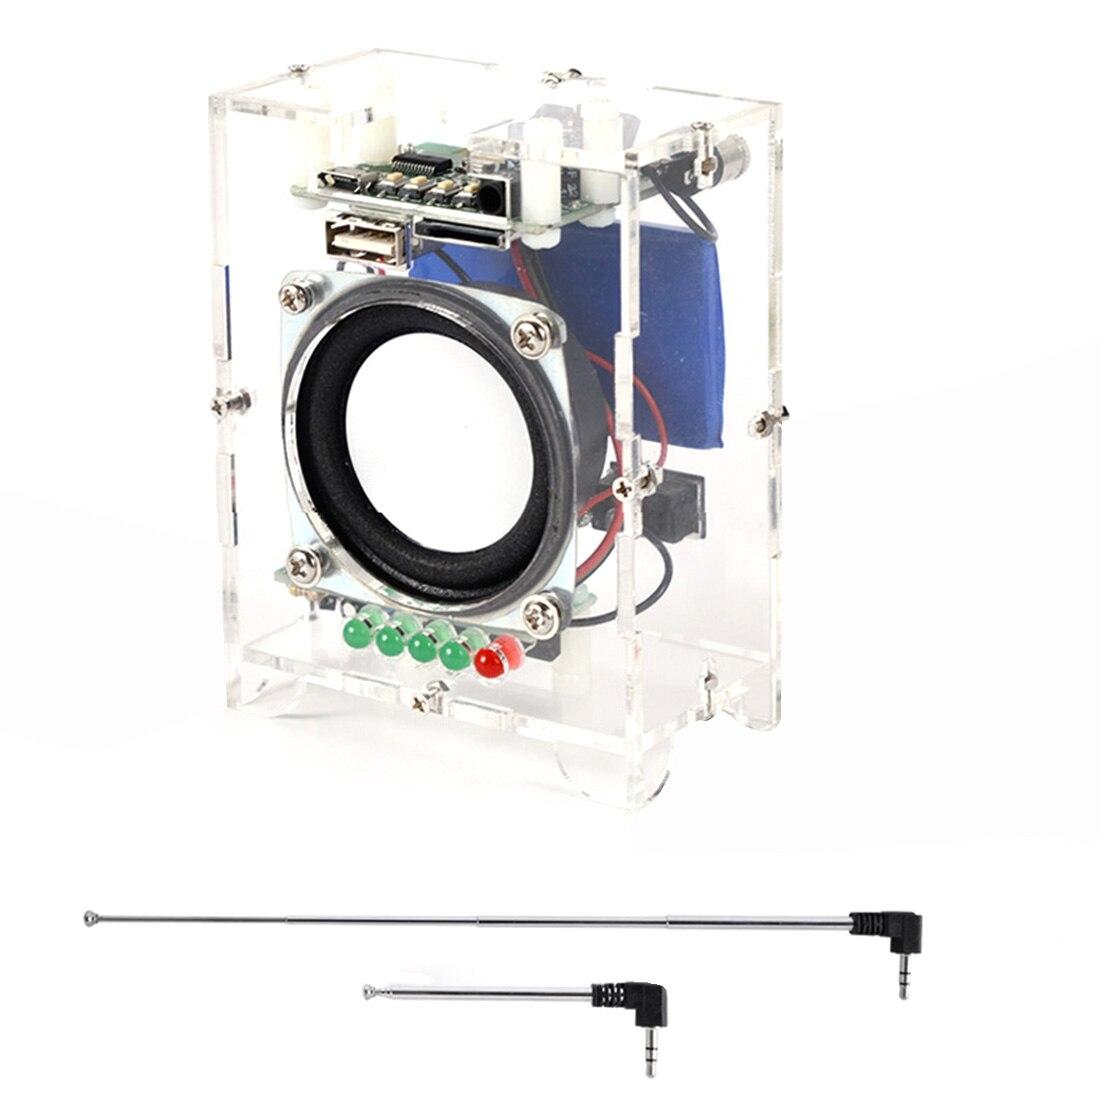 DIY Mini Speaker Kit MP3 Small Speaker Sound Amplifier For Child Kids Developmental Early Educational Toys - Finished Product